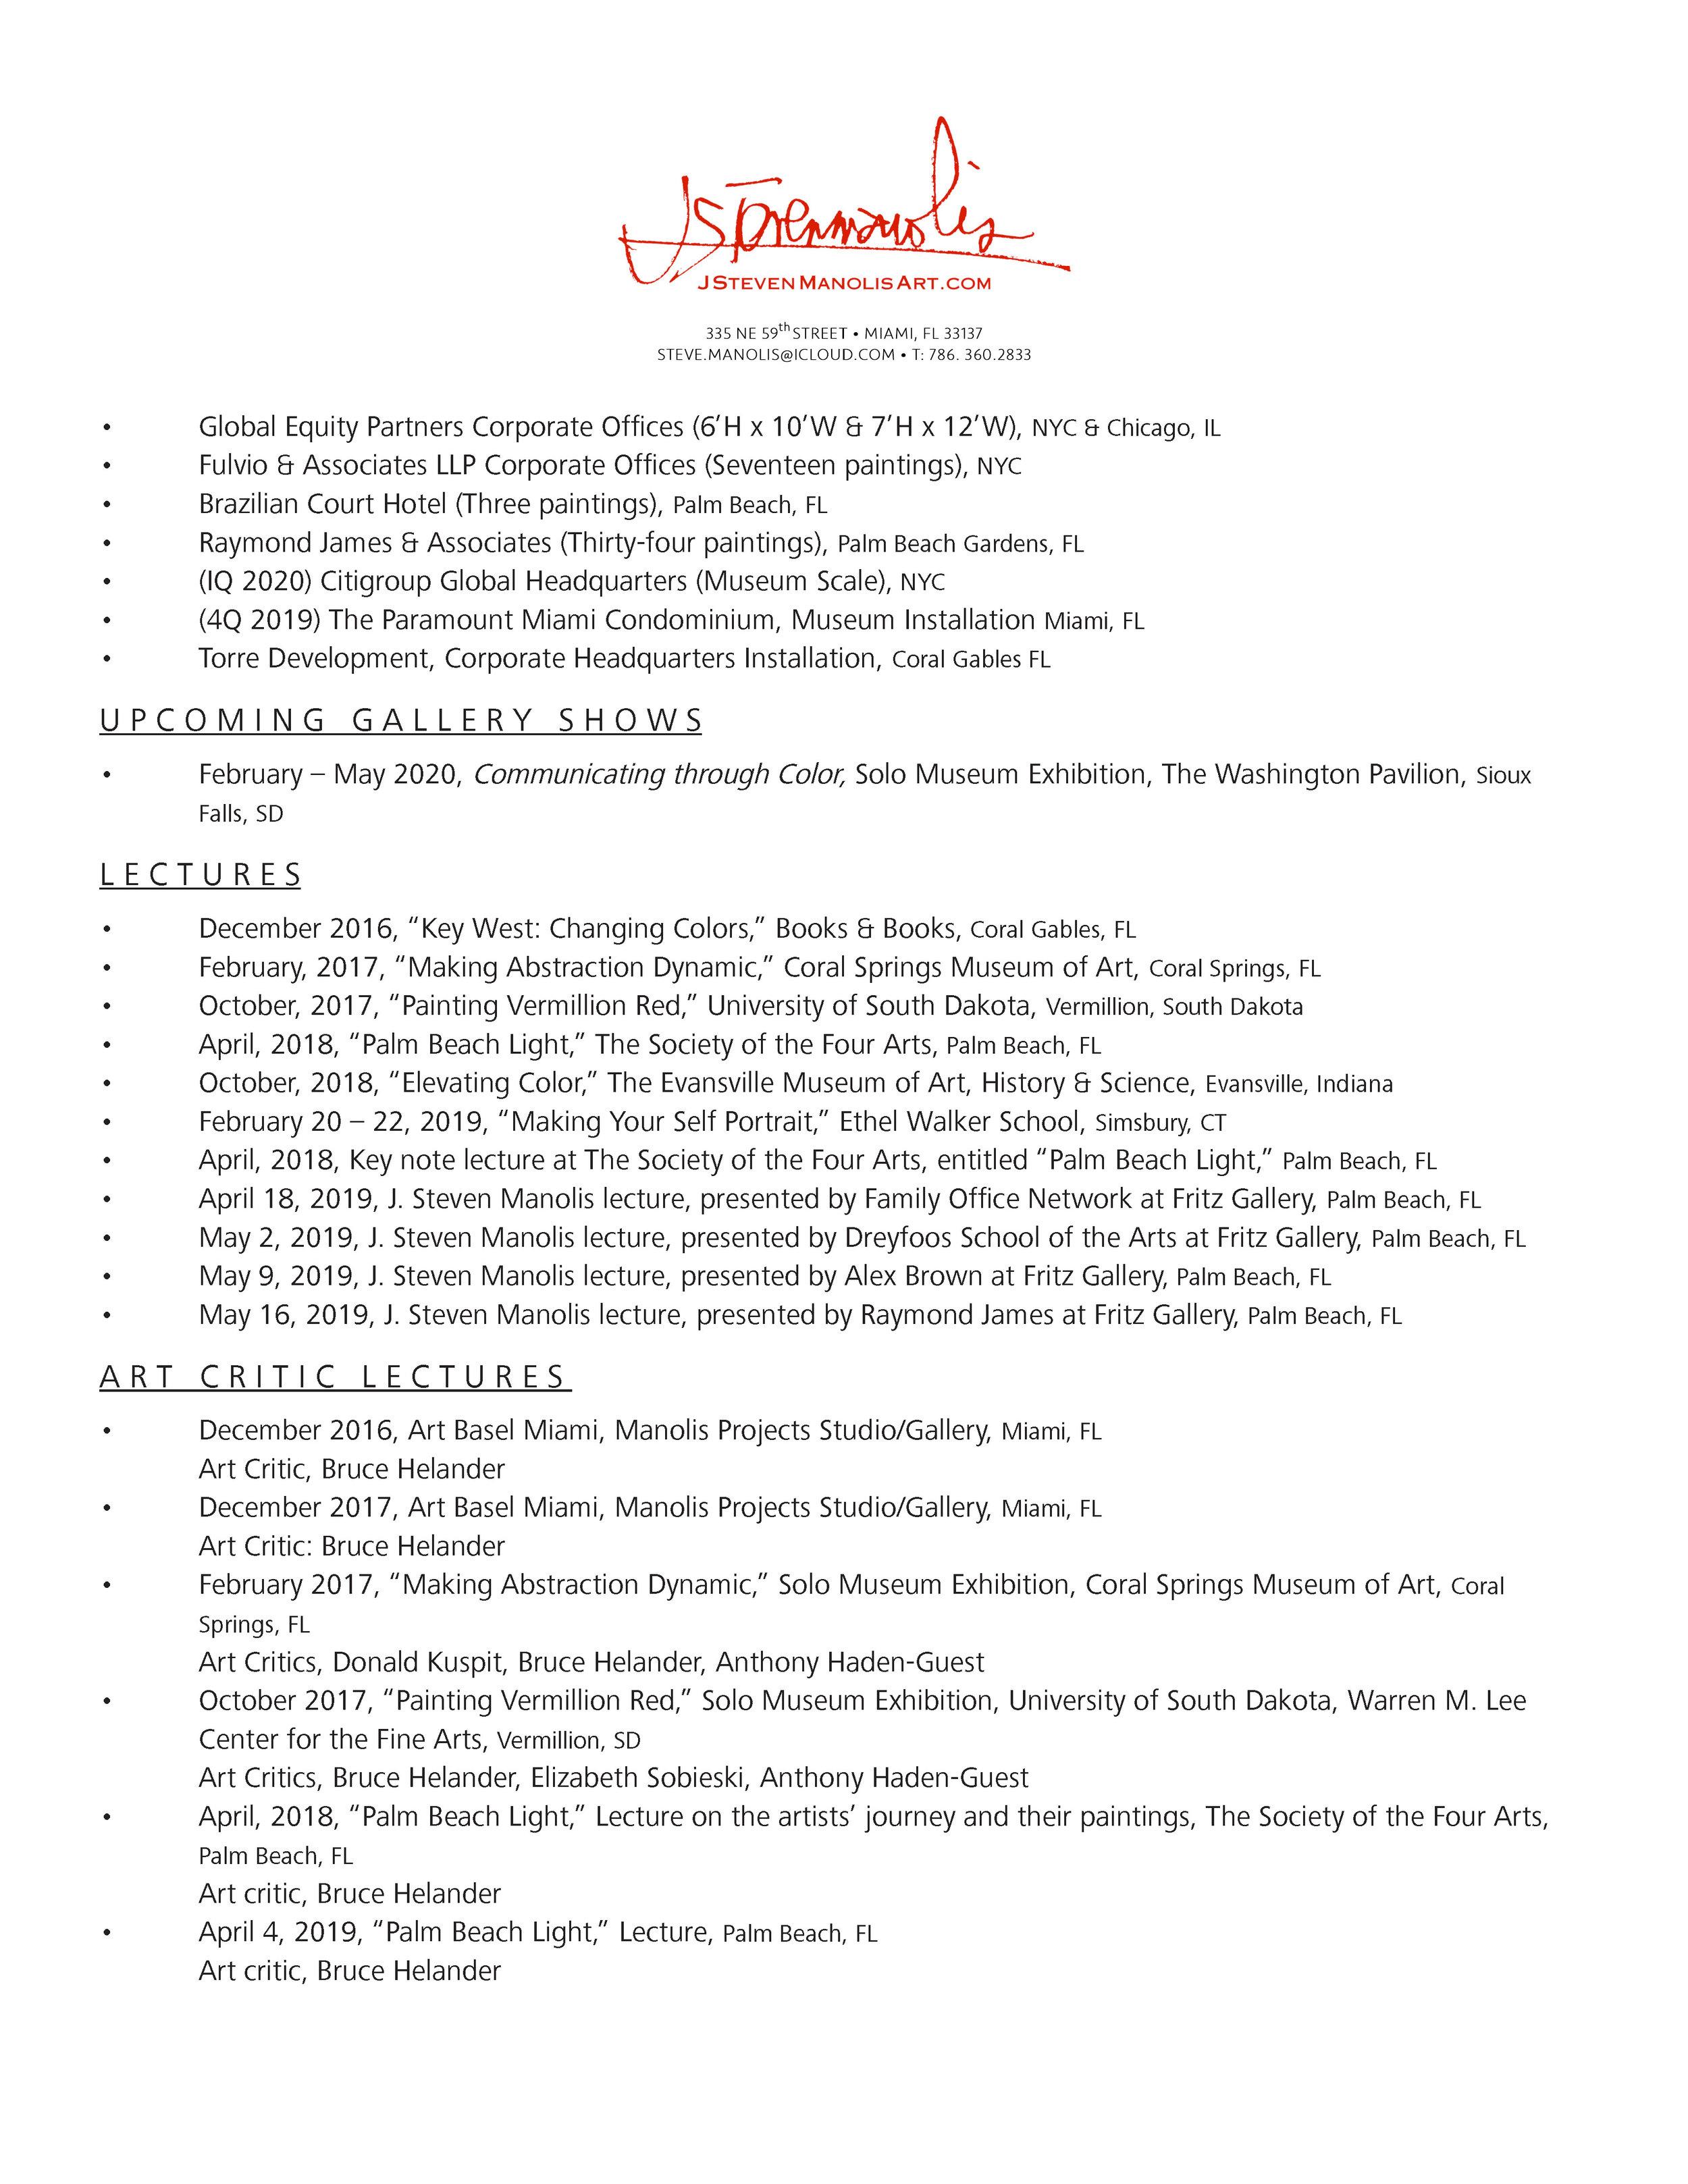 JSM Electronic Resume_Page_4.jpg